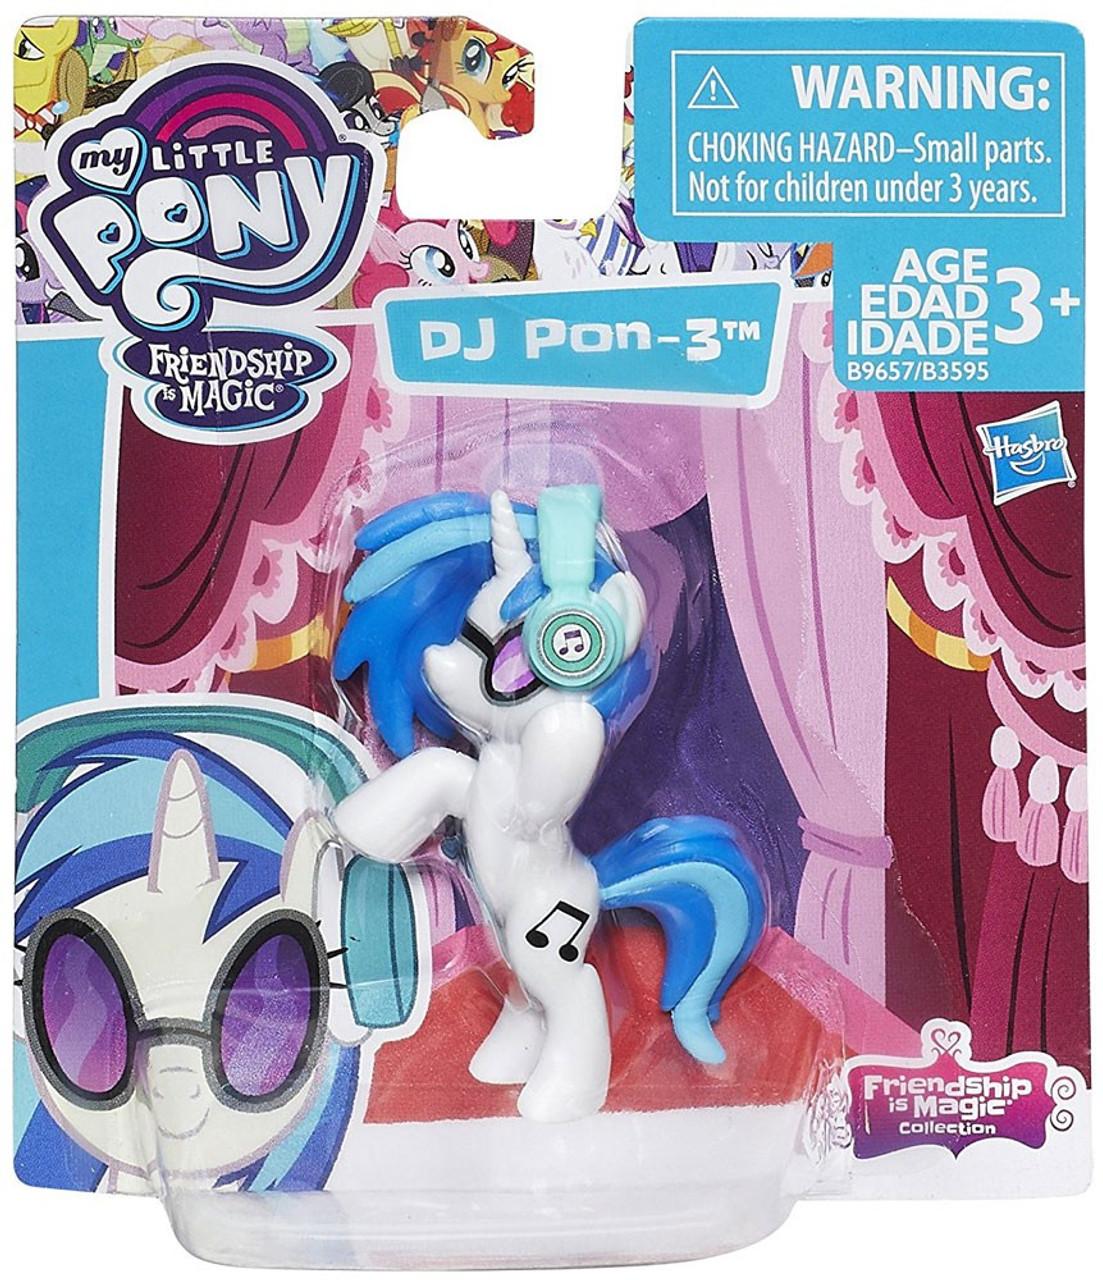 Loose Hasbro My Little Pony Friendship is Magic DJ Pon-3 2-Inch Mini Figure